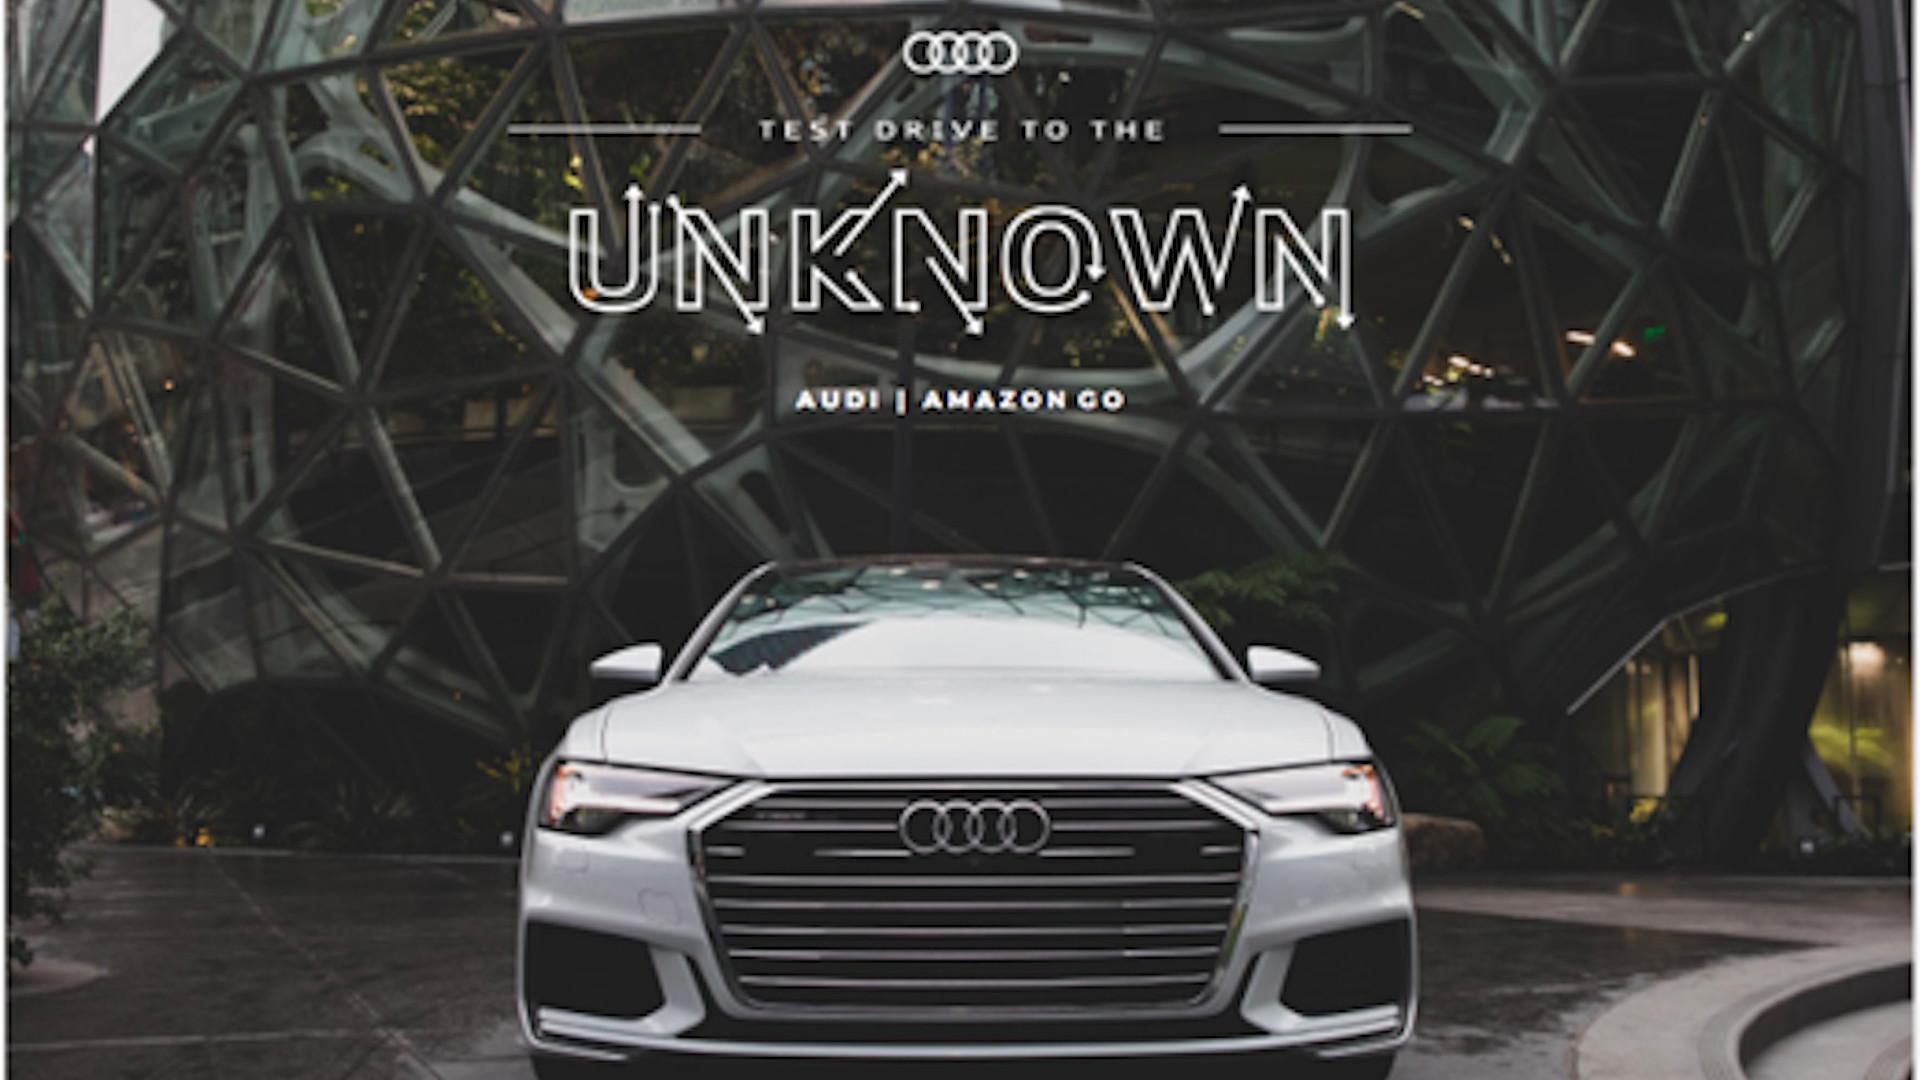 2019 Audi A6 Amazon Go test drives